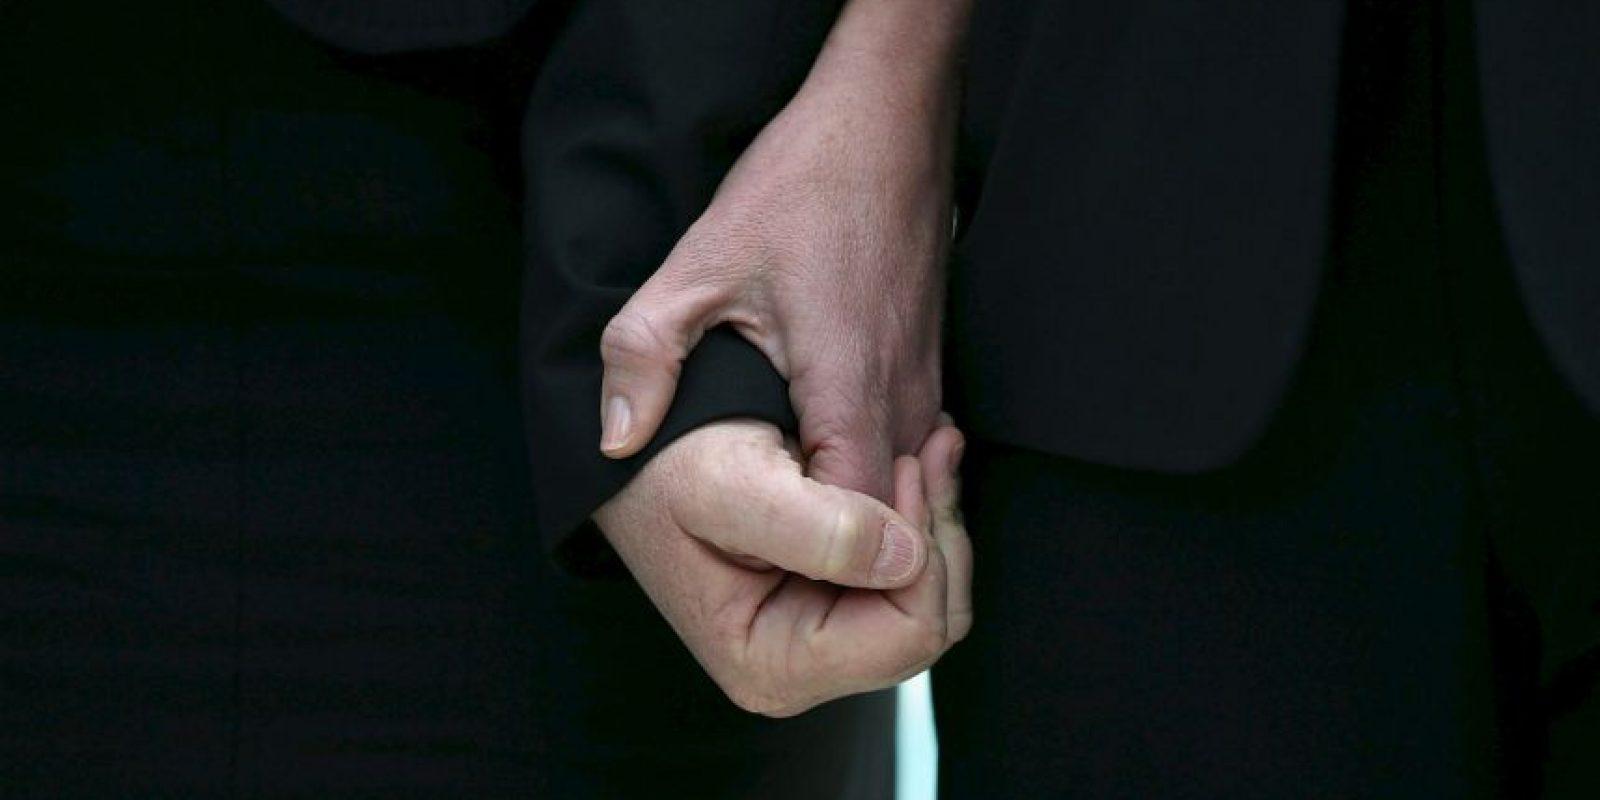 Violencia contra la mujer Foto:Getty Images